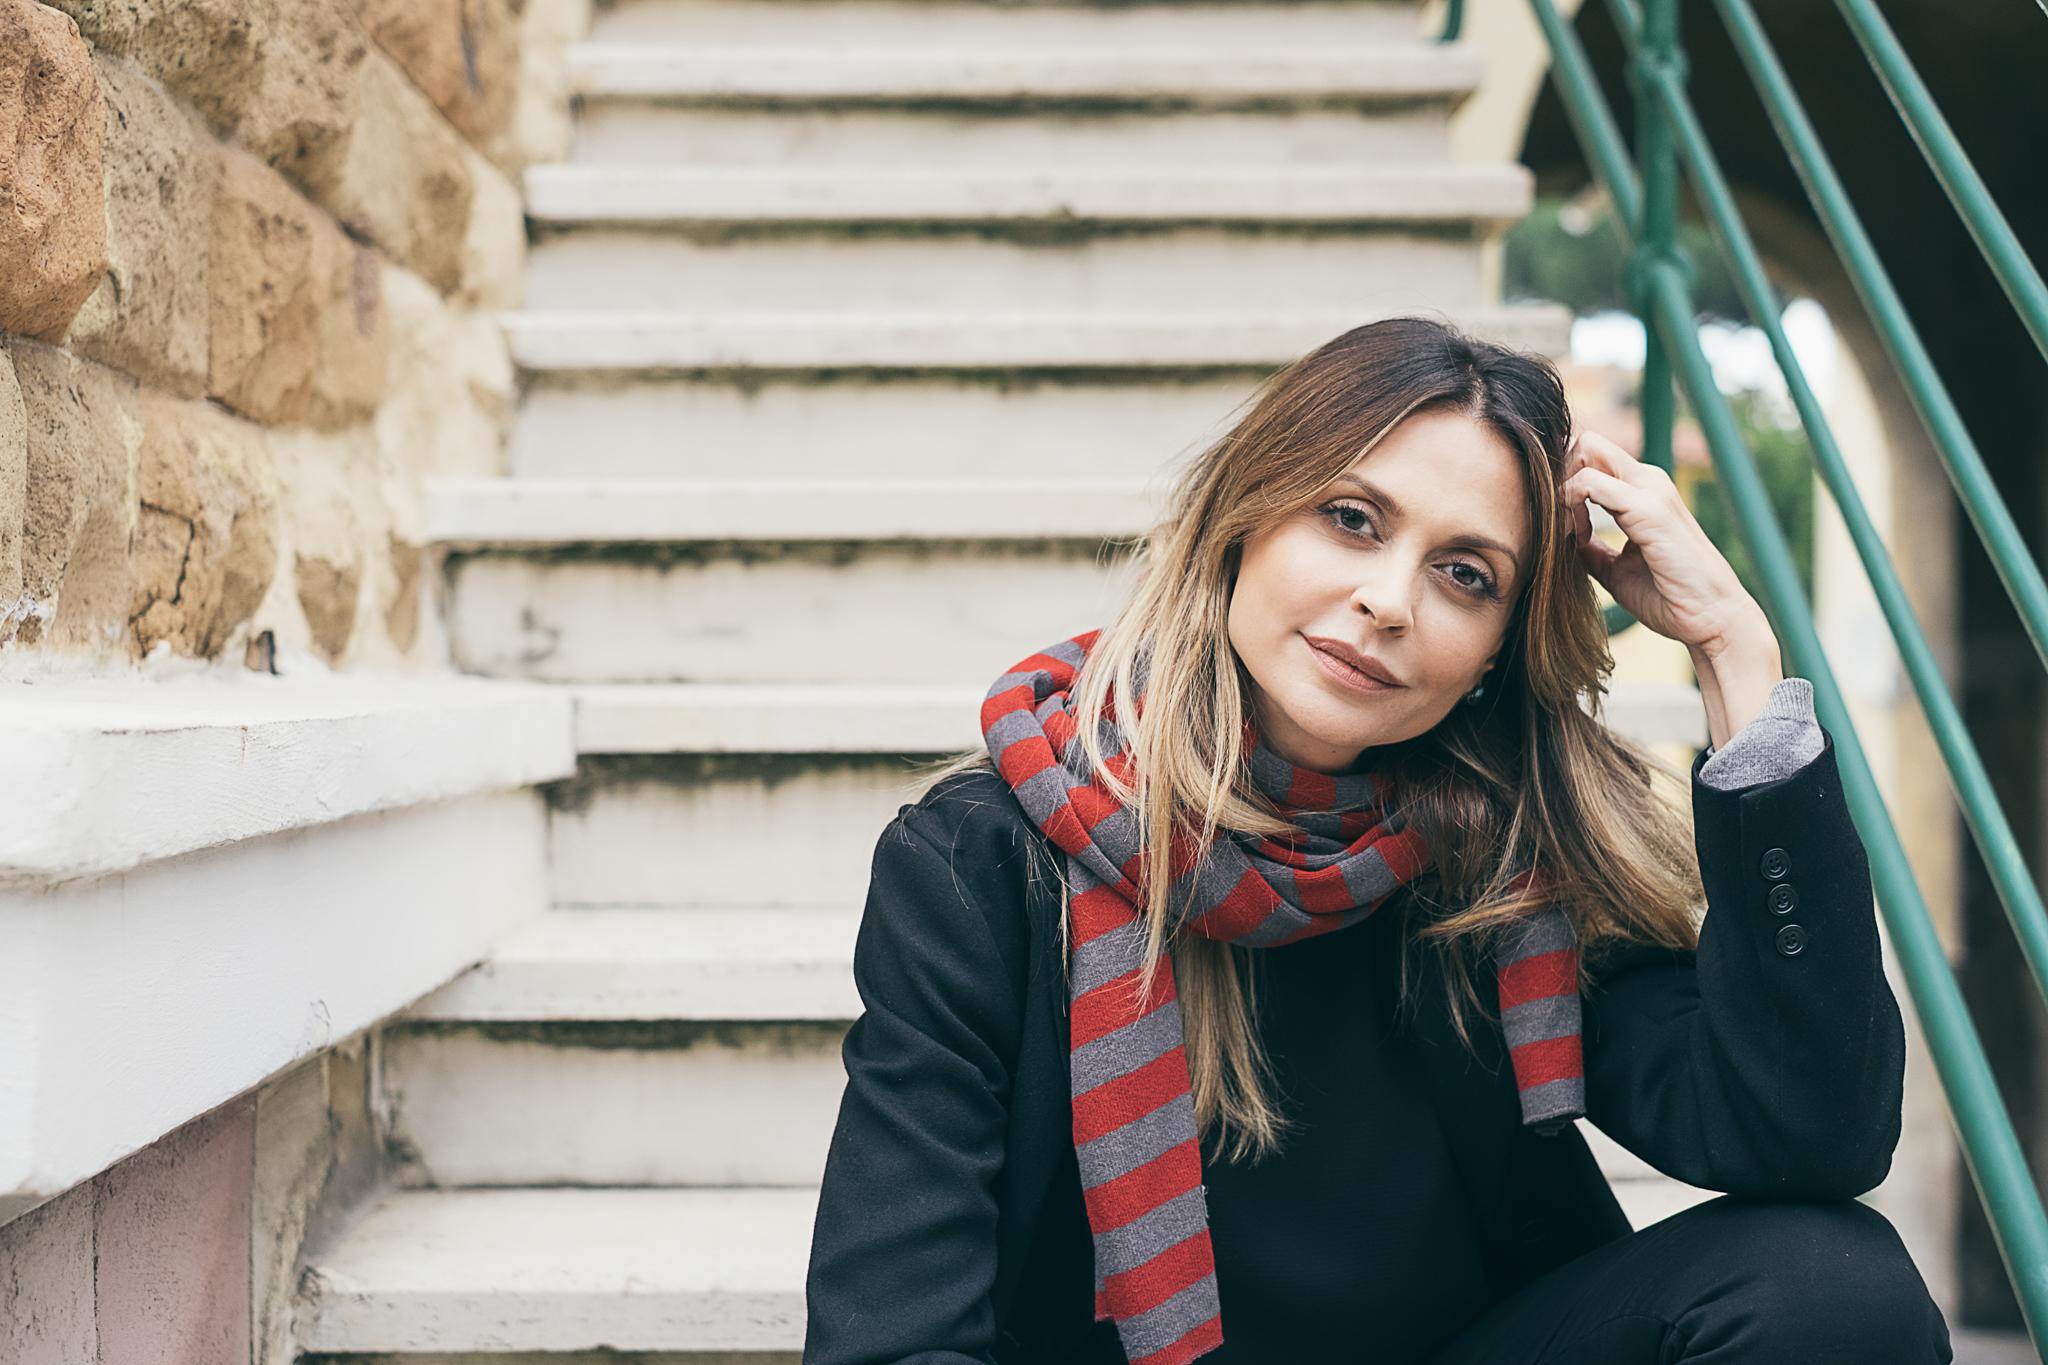 Ritratti_Elda Alvigini2017 (7)